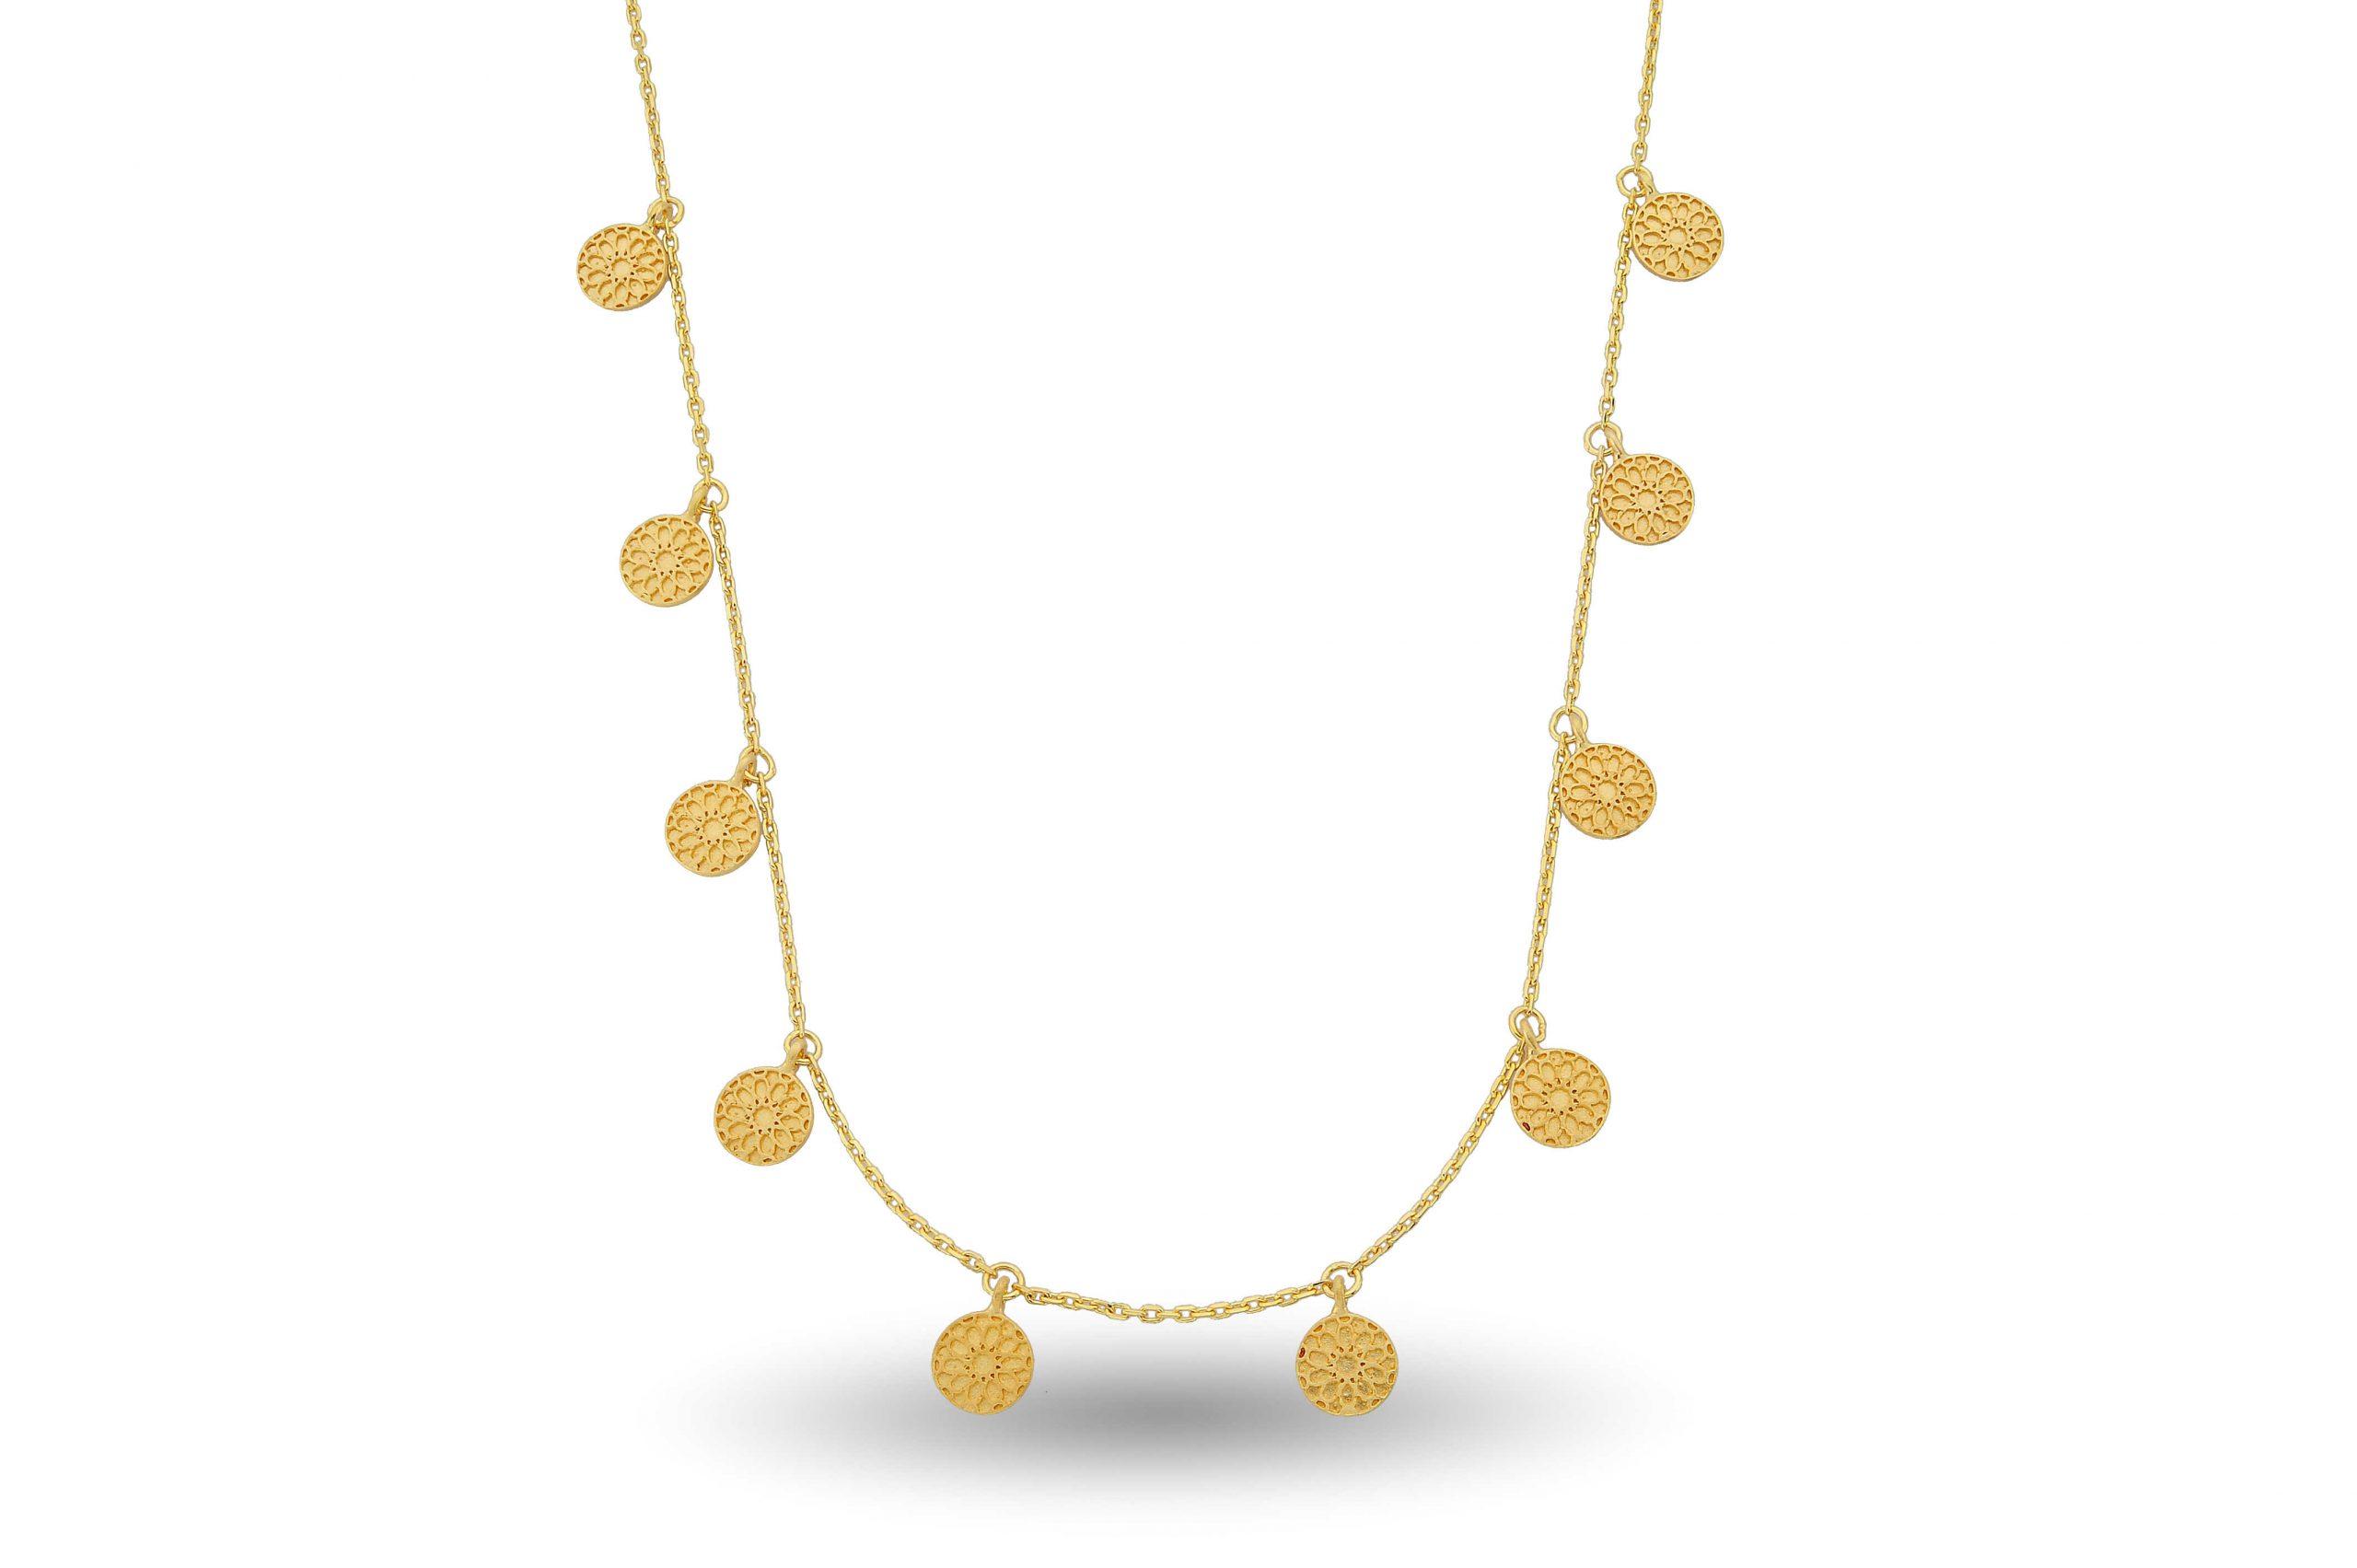 Necklace, shevin chocker Bosperous